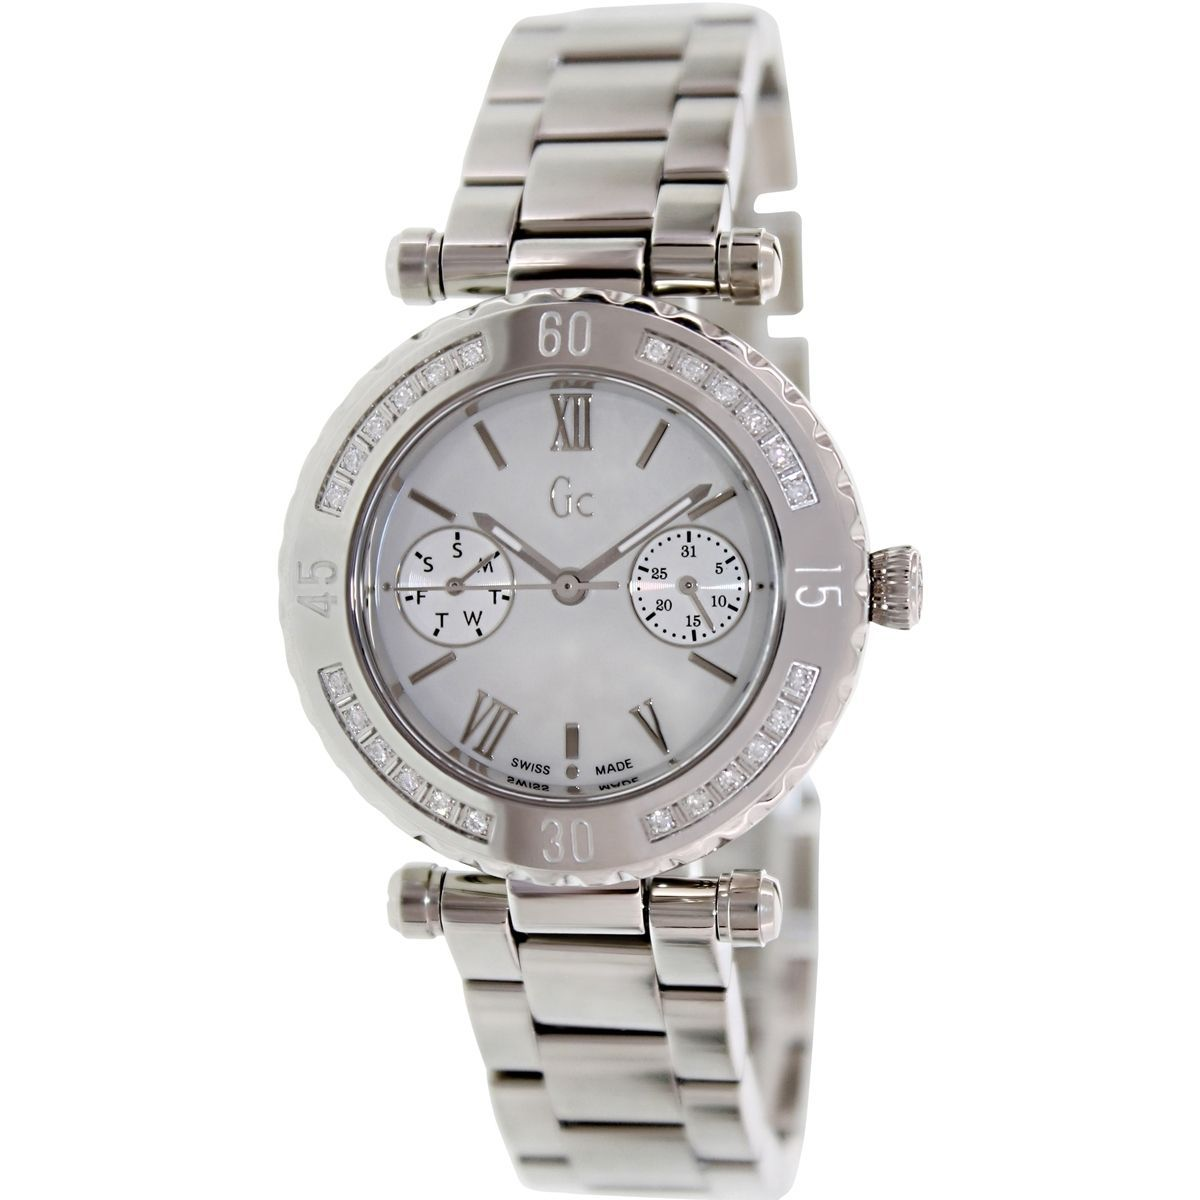 Guess Men's X42107L1S Silvertone Swiss Quartz Watch